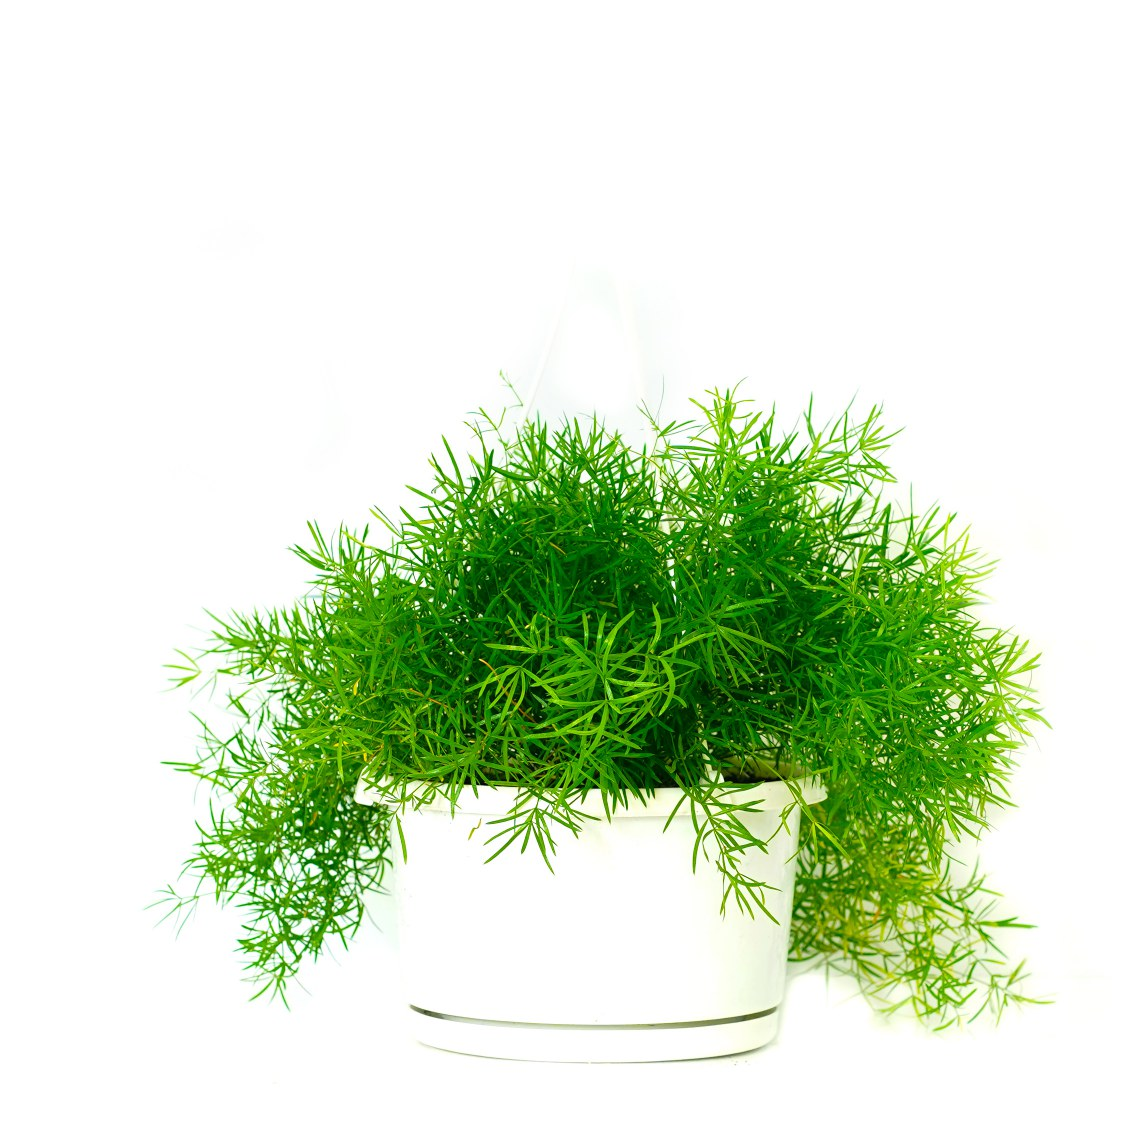 Sprengeri Asparagus Indoor Plants